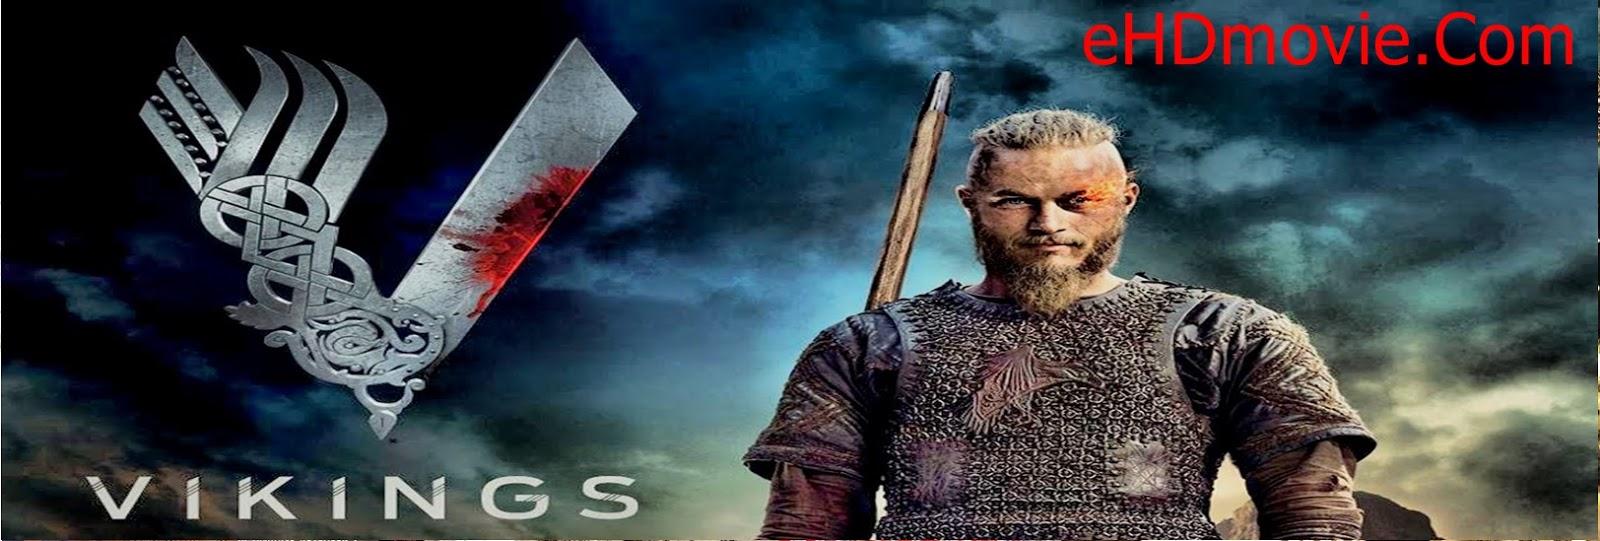 Vikings Season 1 Complete Dual Audio 720p BRRip [Hindi – English] ESubs